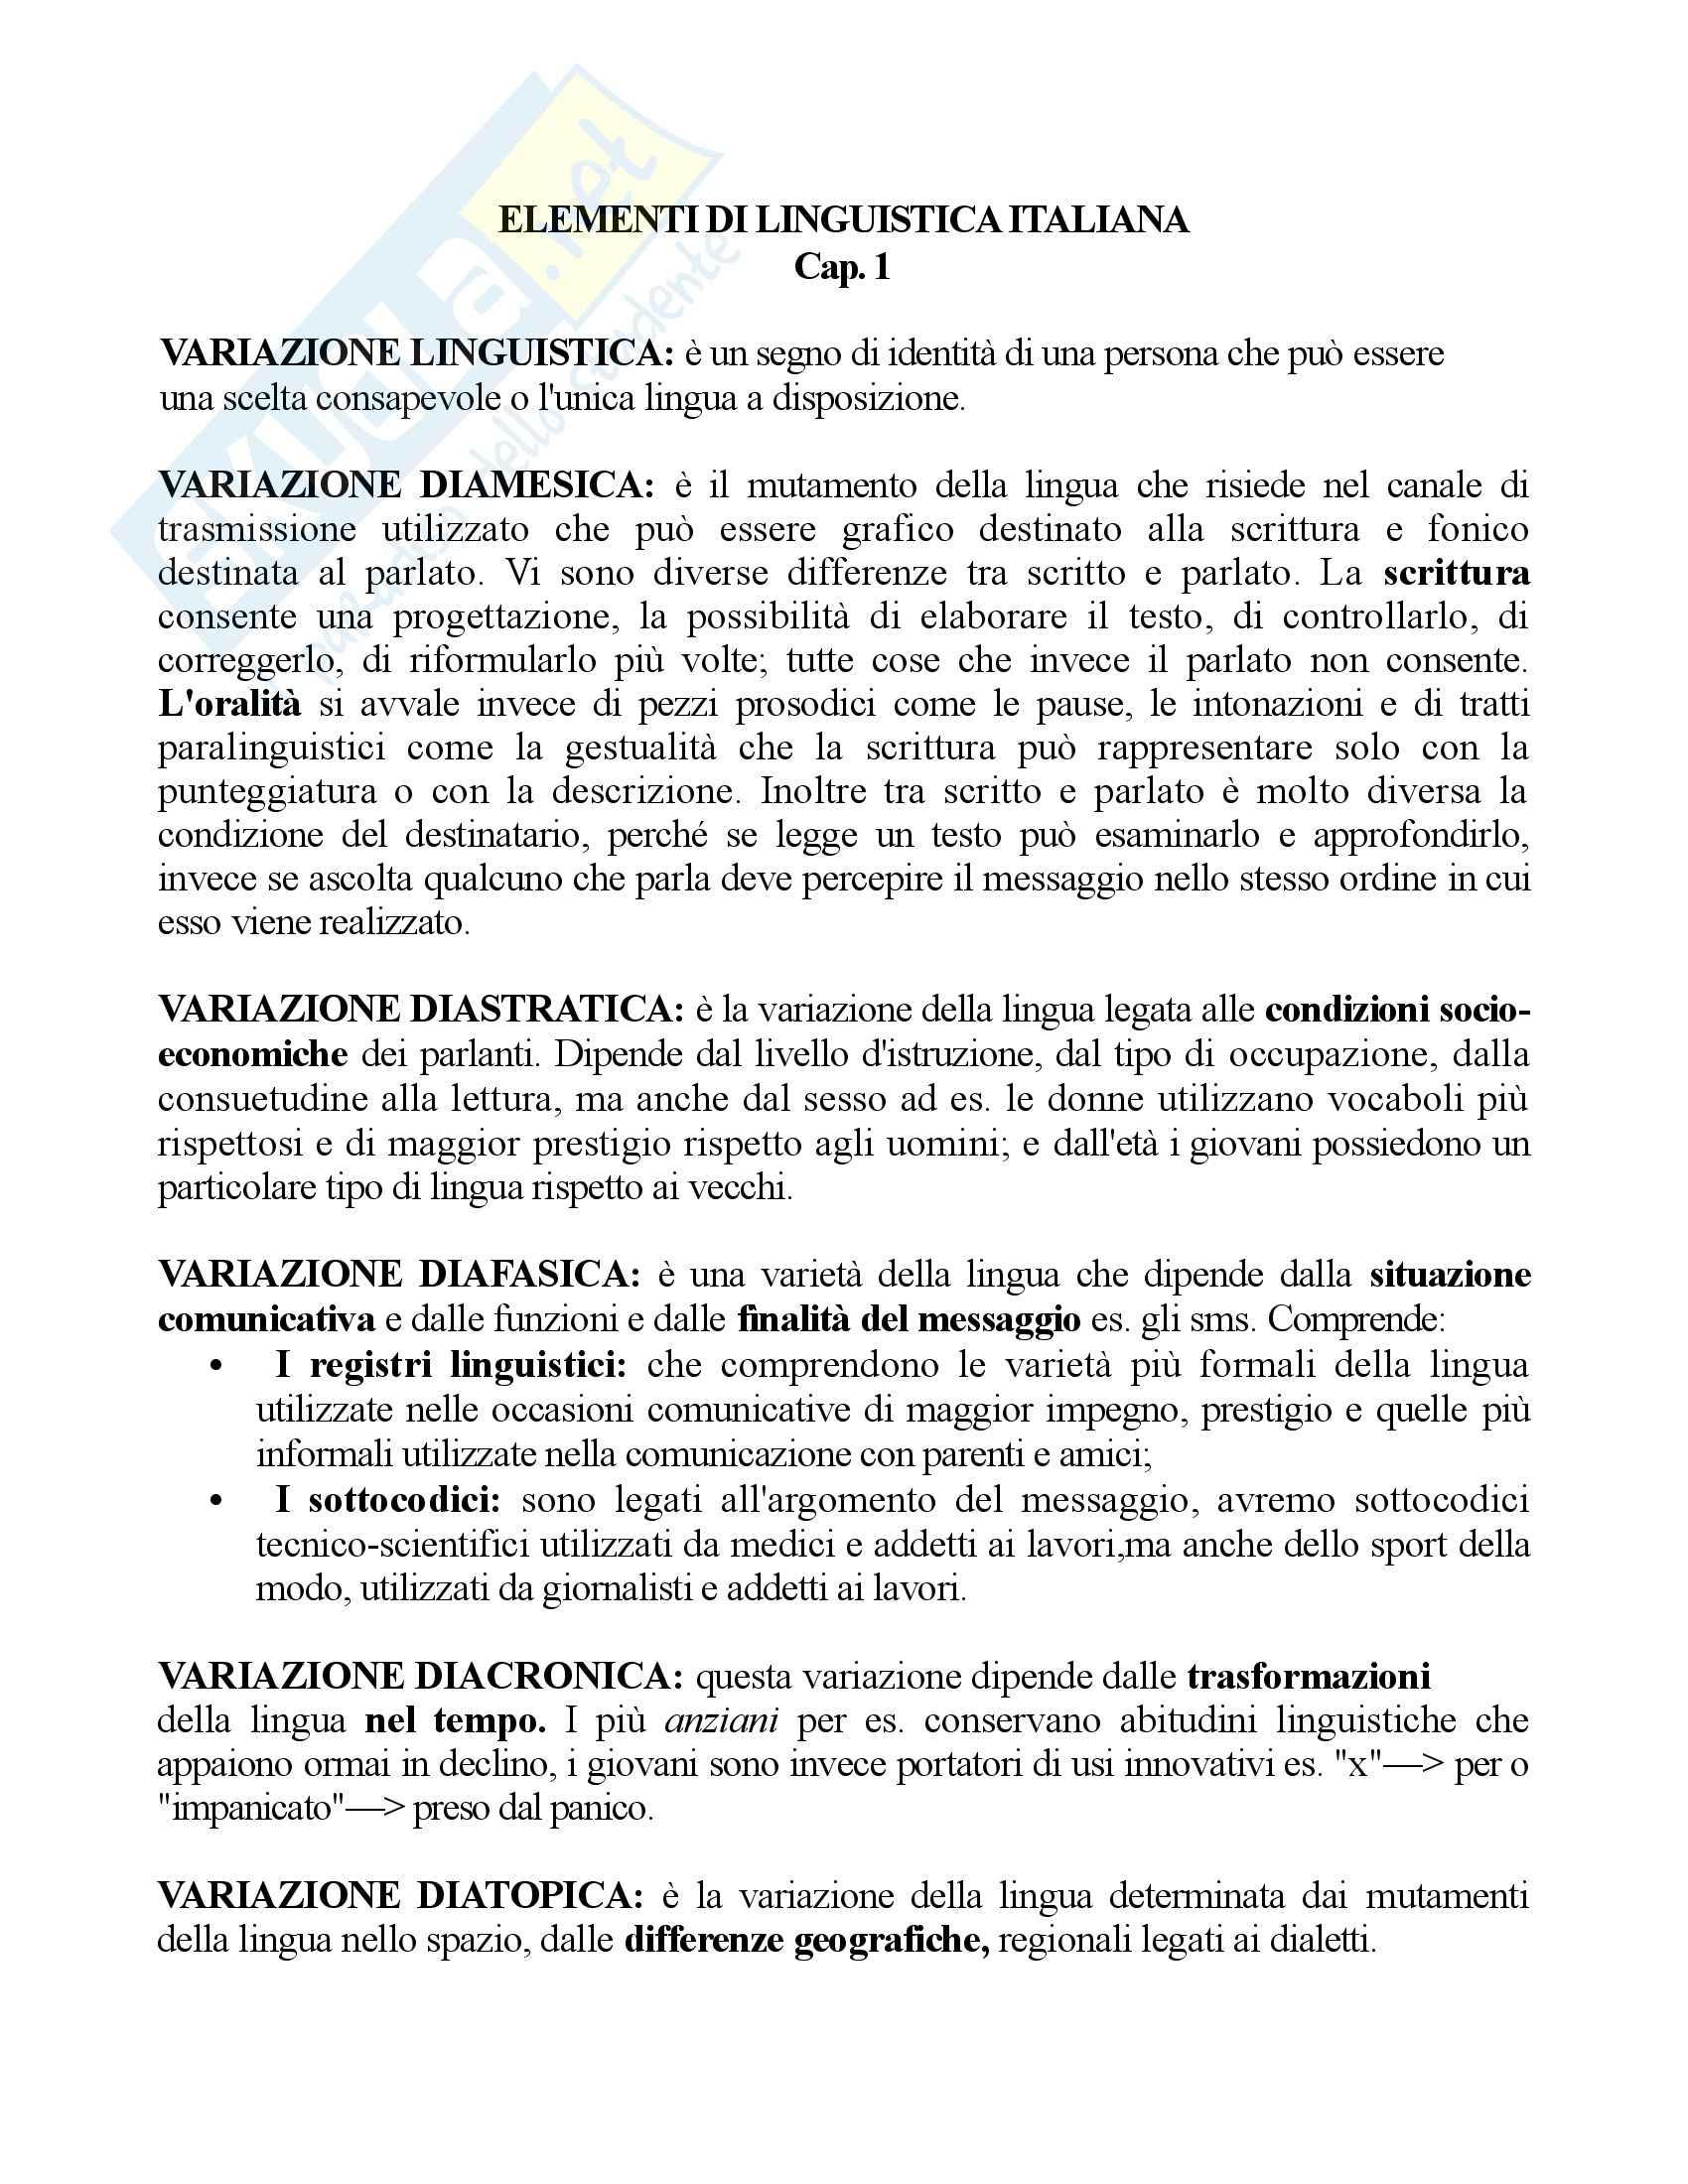 Elementi di linguistica italiana - Riassunto esame, prof. Vignuzzi